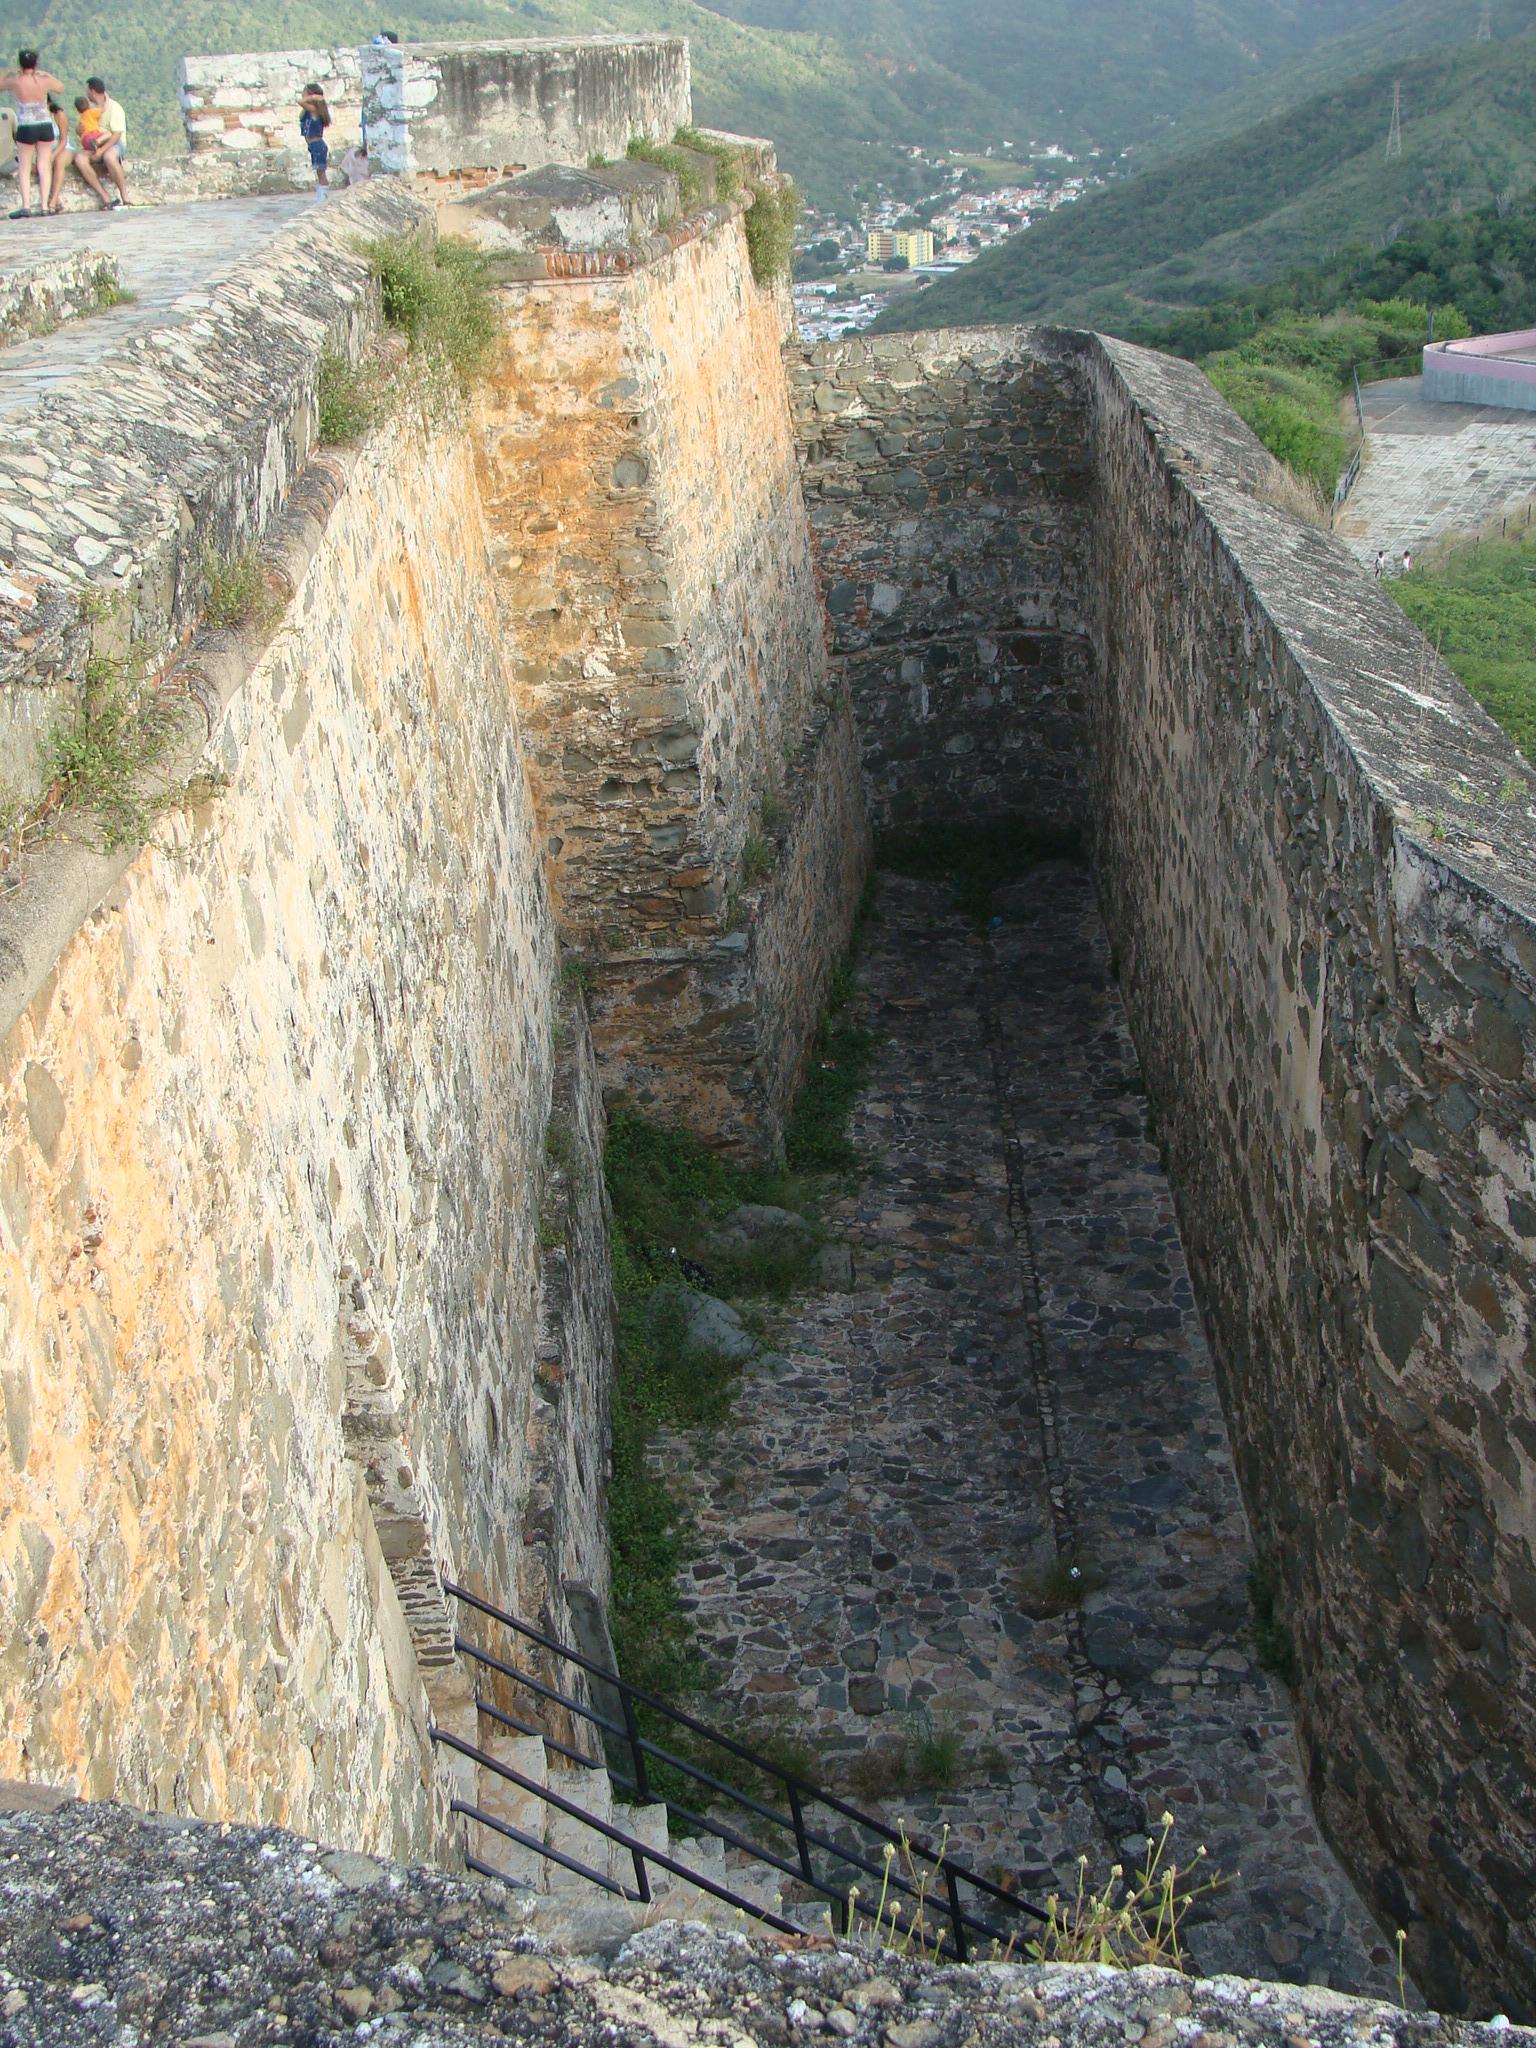 Vista desde arriba del Fortin de lq parte posterior